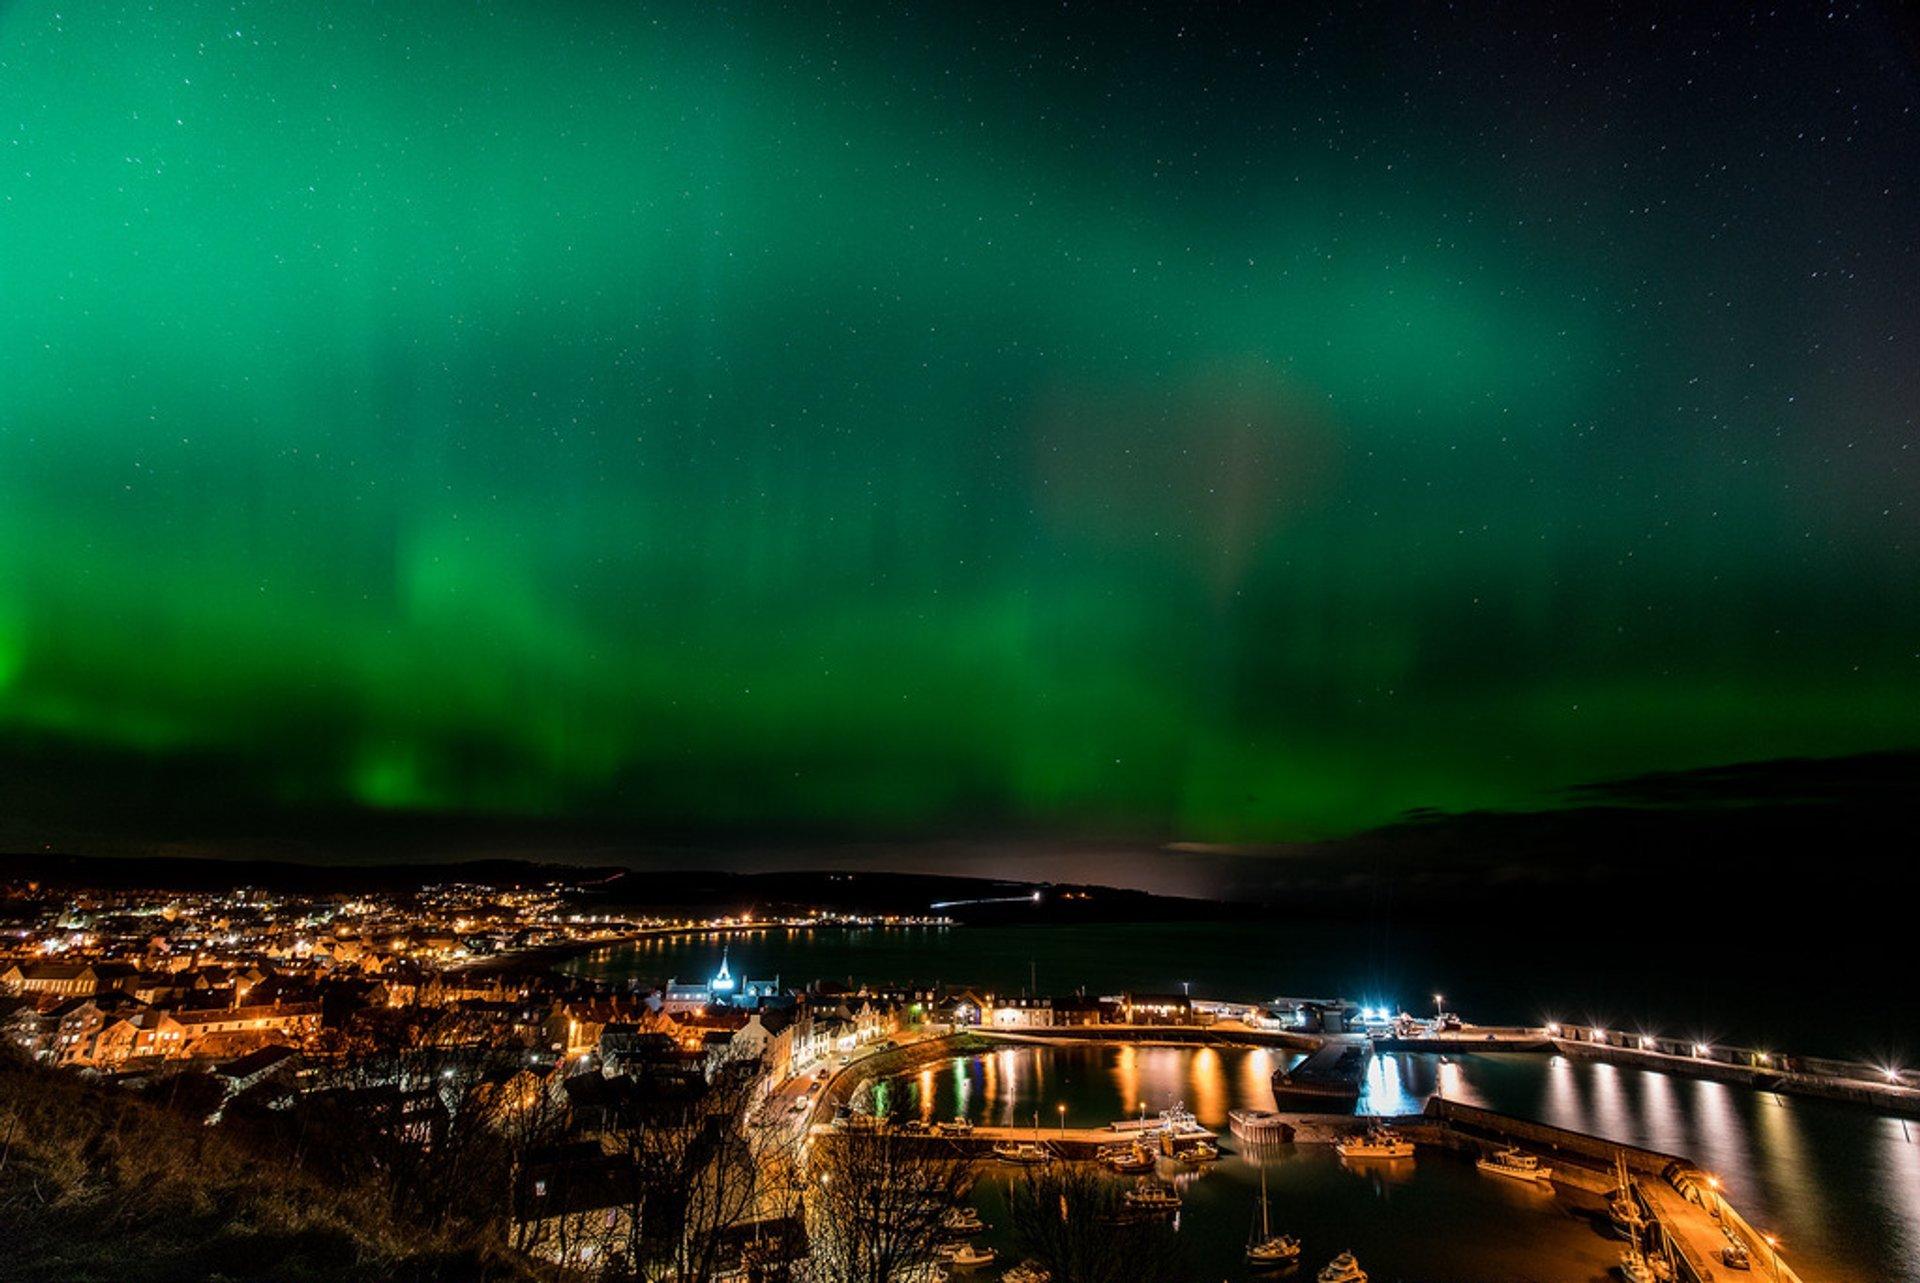 Aurora Borealis over Aberdeenshire, Scotland 2020